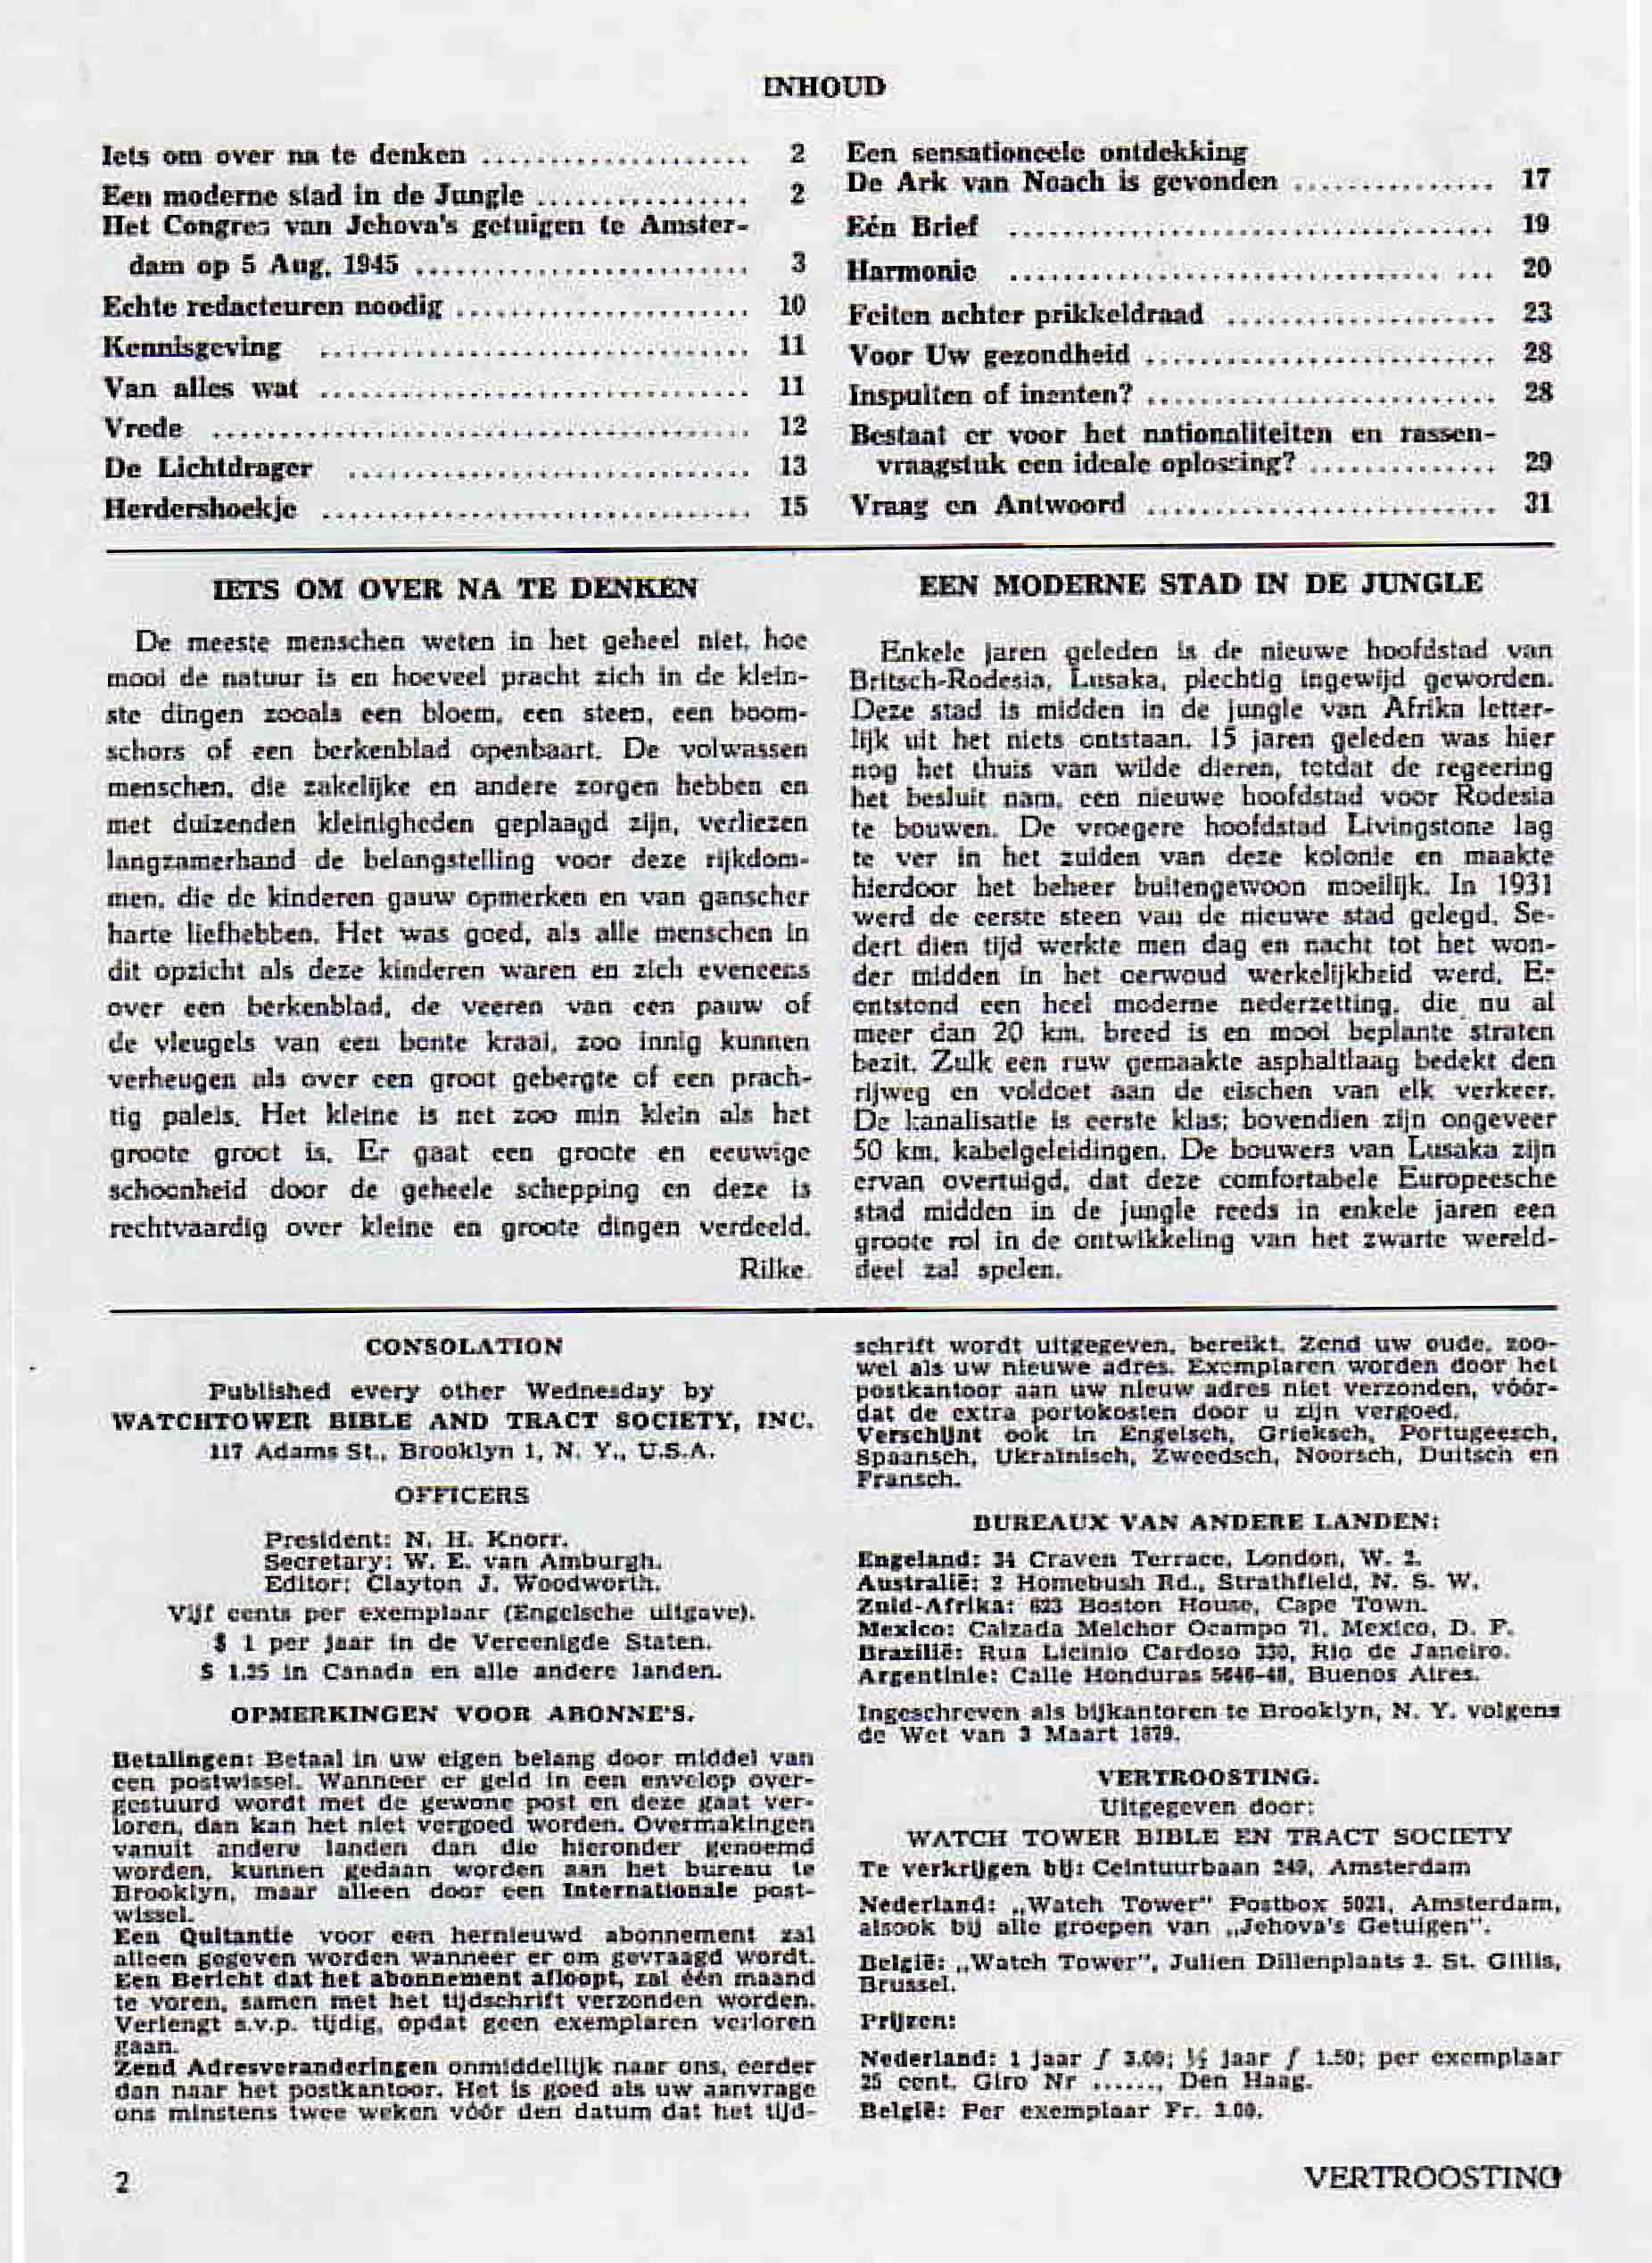 File0019-2